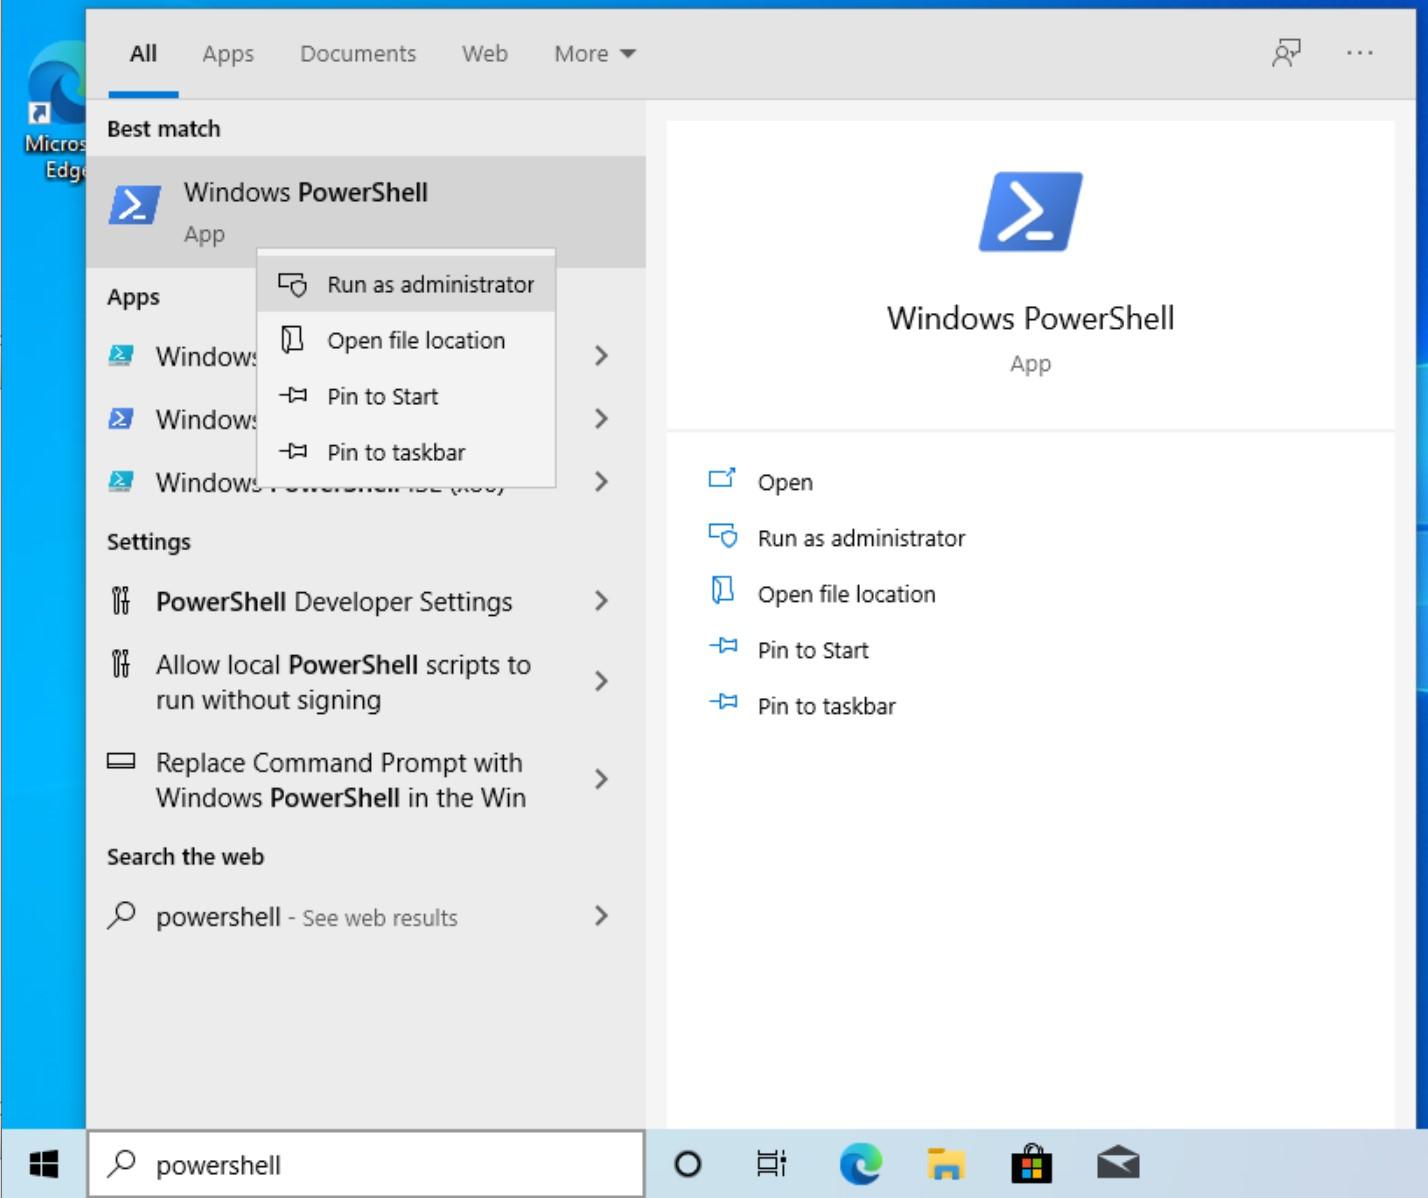 Open Windows PowerShell as an administrator